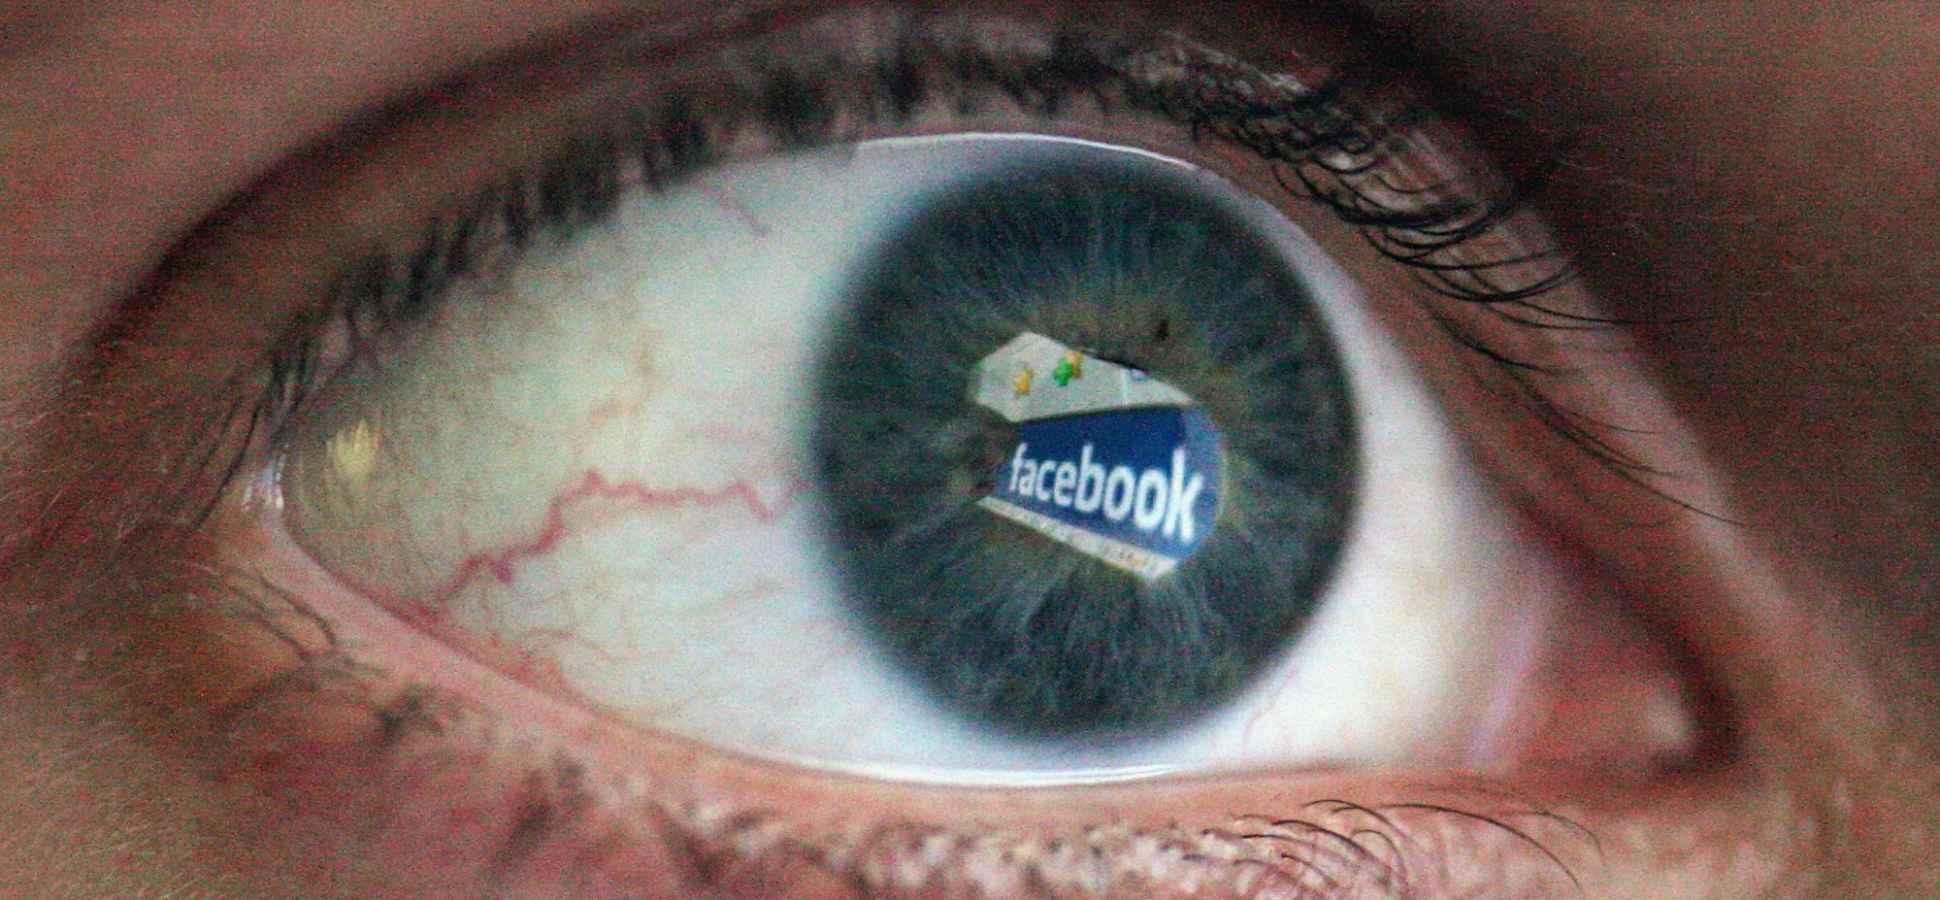 Meet Facebook Watch, Mark Zuckerberg's Response to Netflix and YouTube